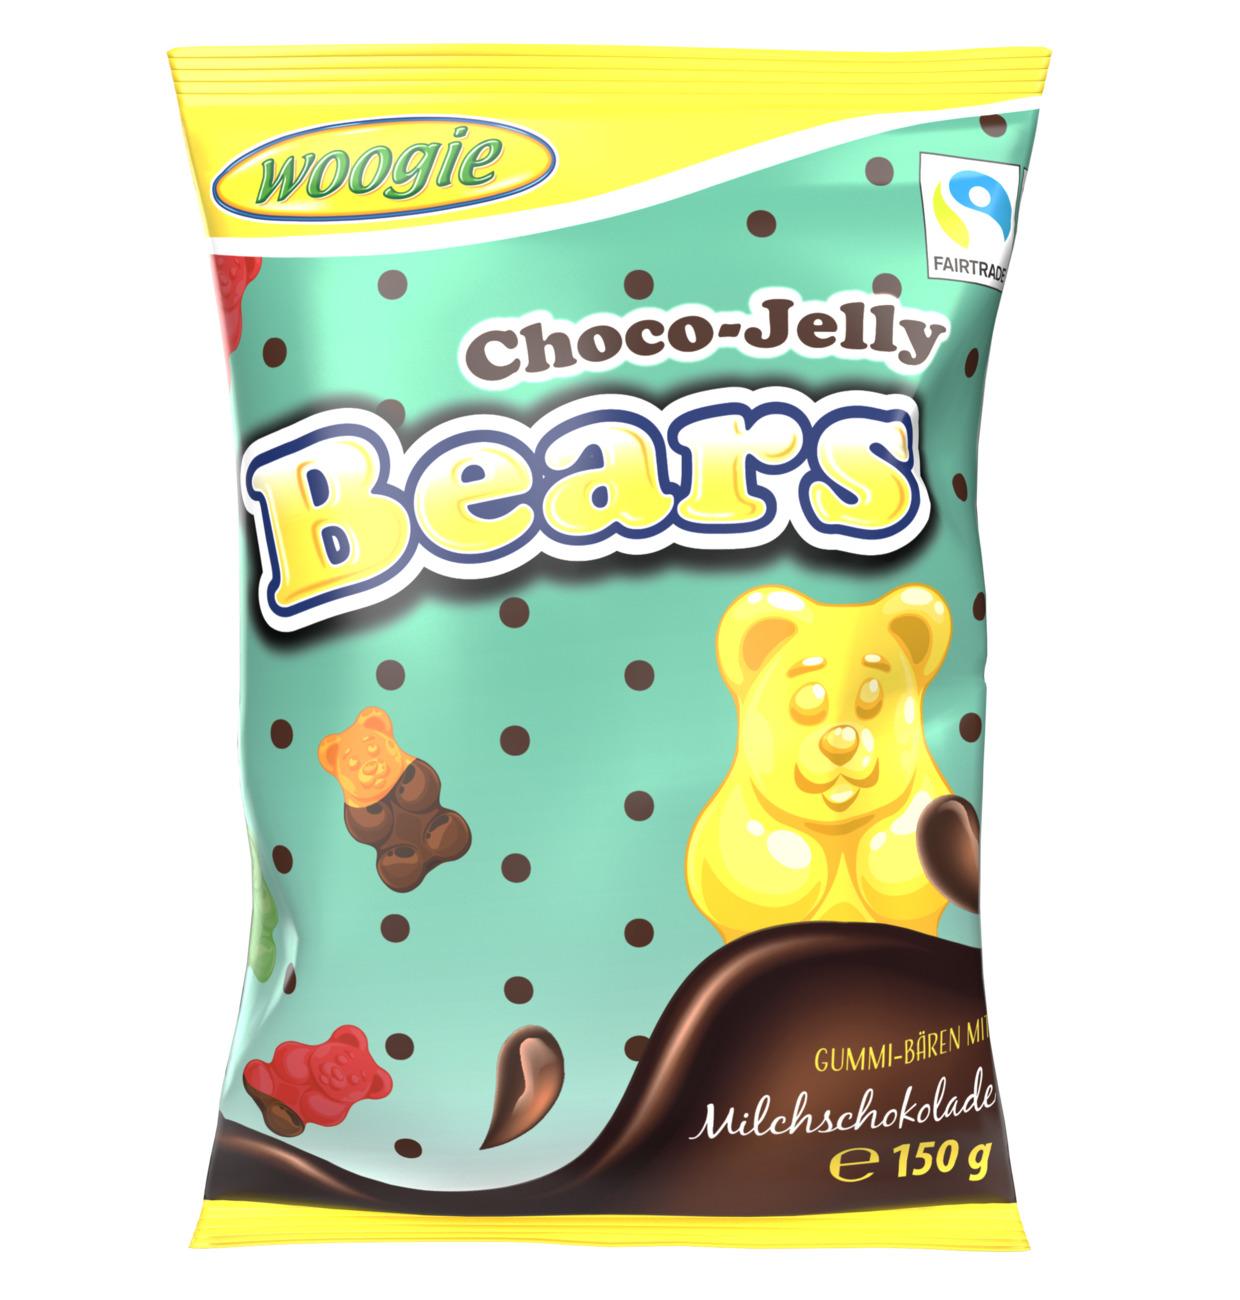 Woogie Choco Jelly Bears 150g